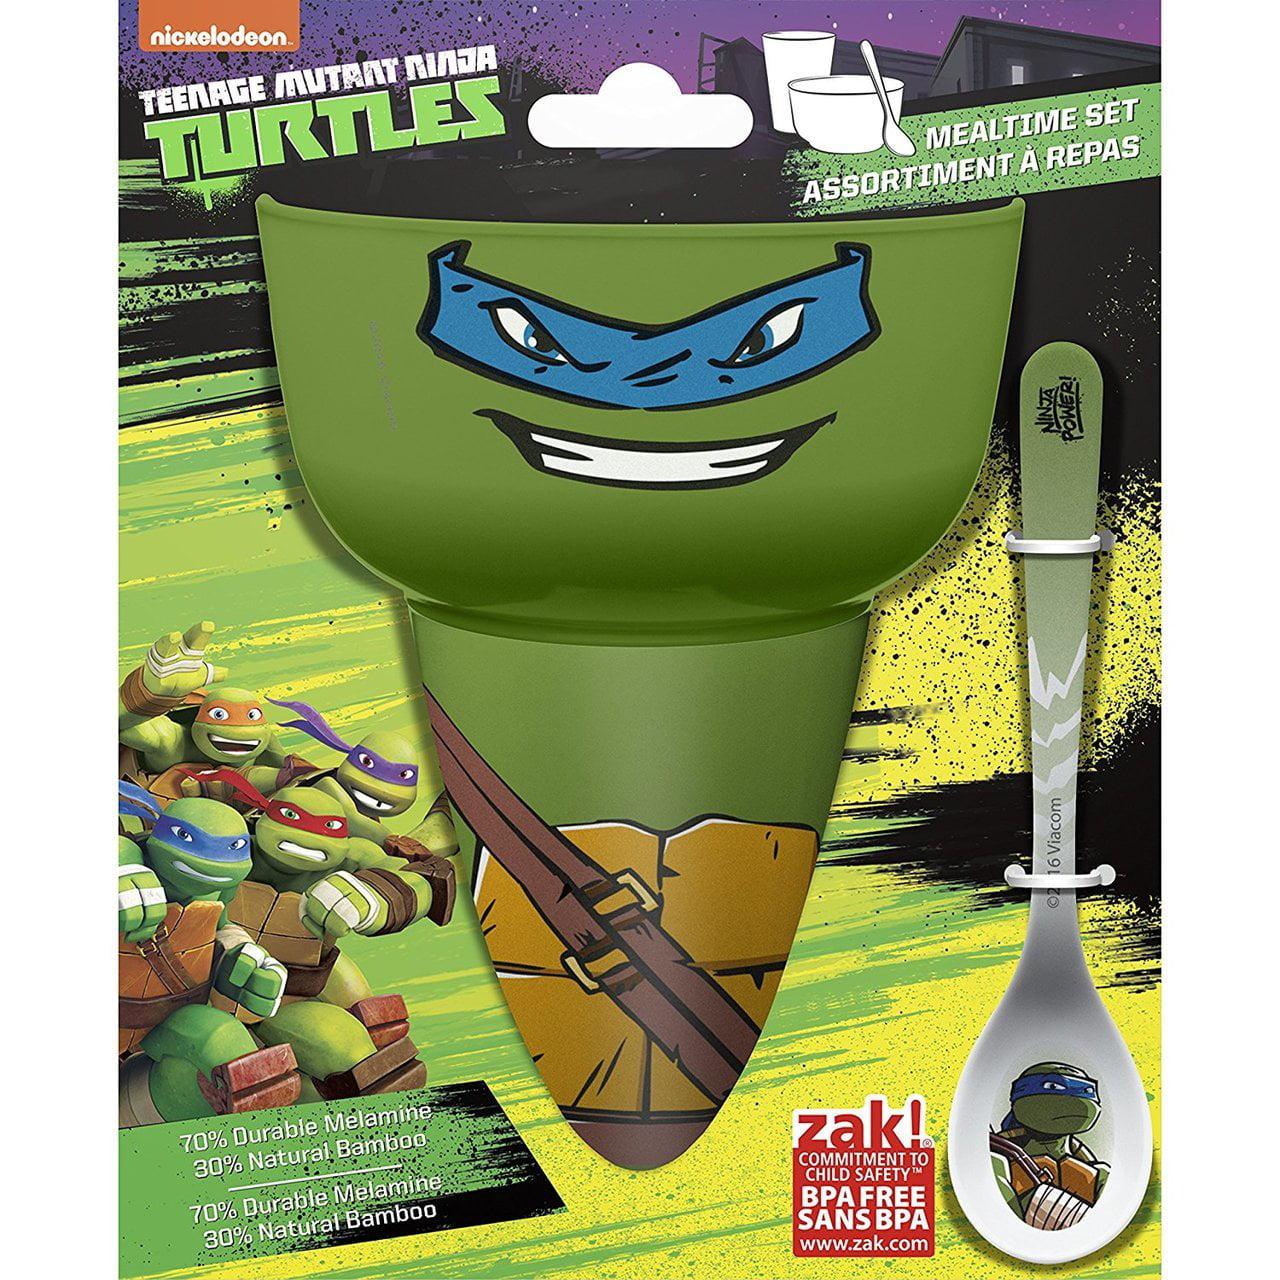 Zak Designs 3 Piece Bowl/Tumbler/Spoon Featuring Leonardo